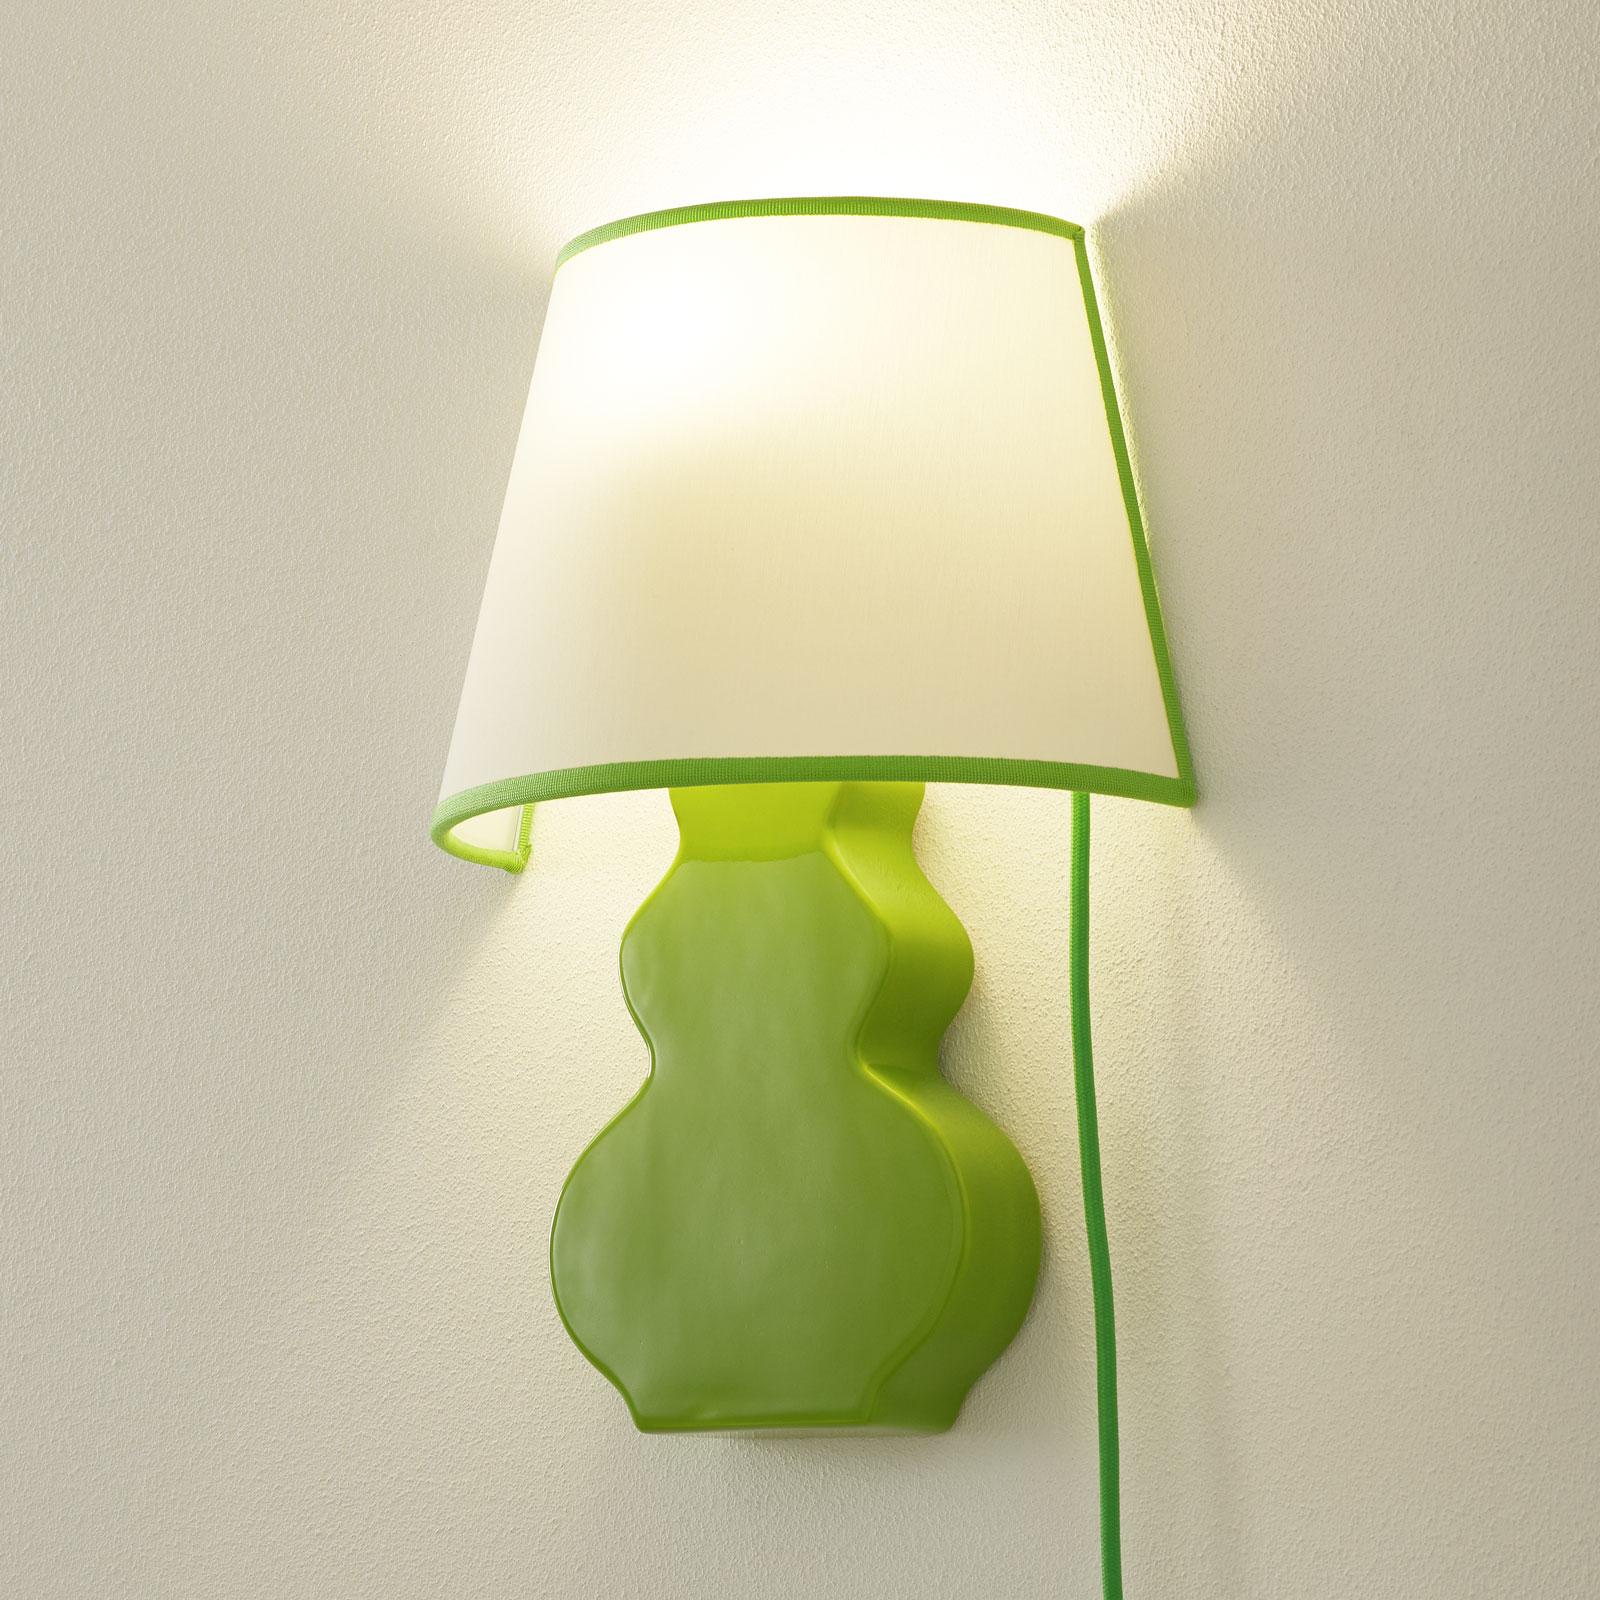 Keramik-Wandleuchte A187 mit Stoffschirm, grün